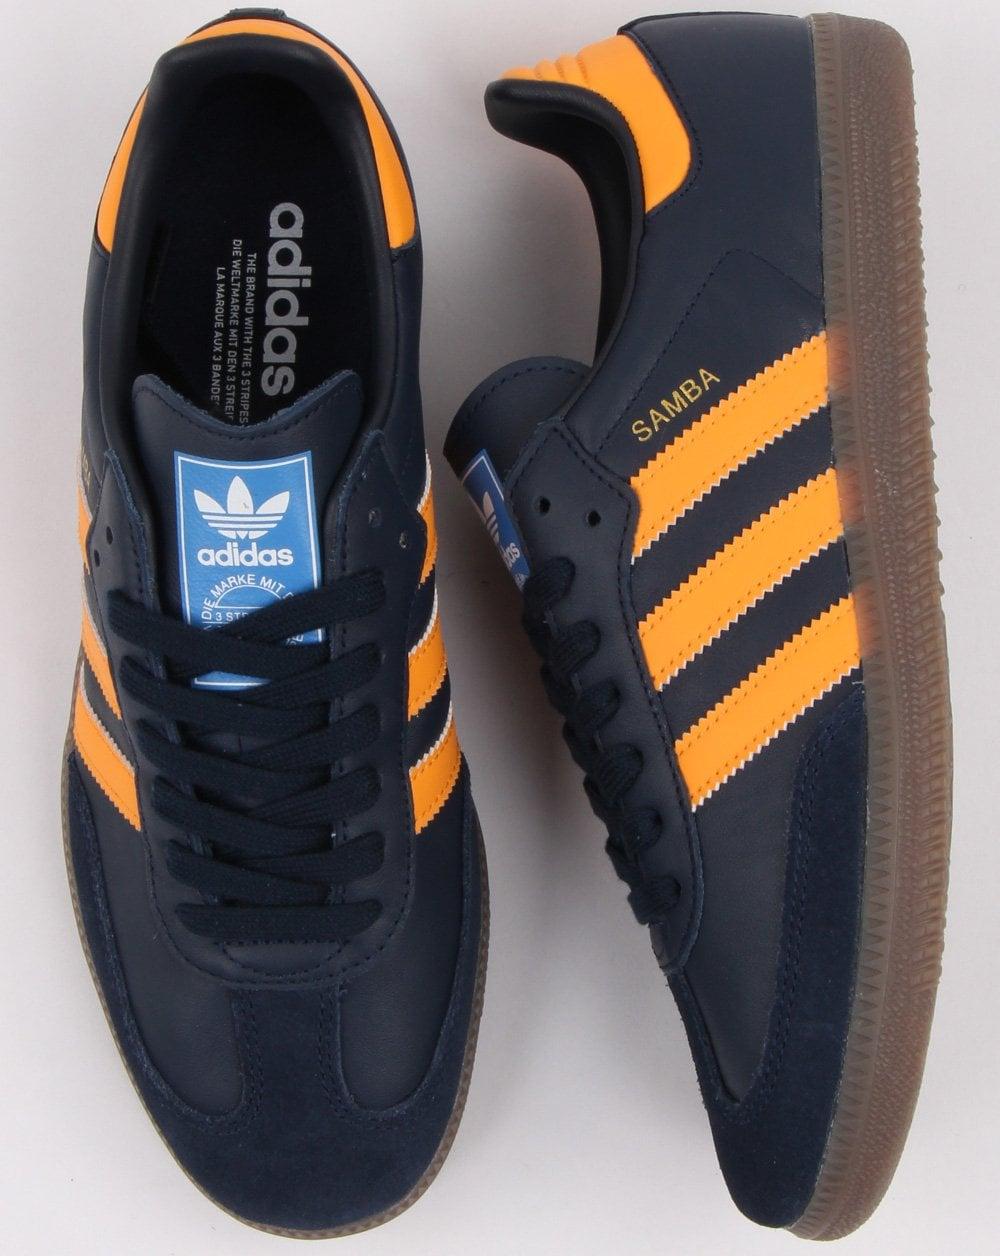 Adidas Scarpe Sneakers Samba Og Ft Navy Modernist Shop